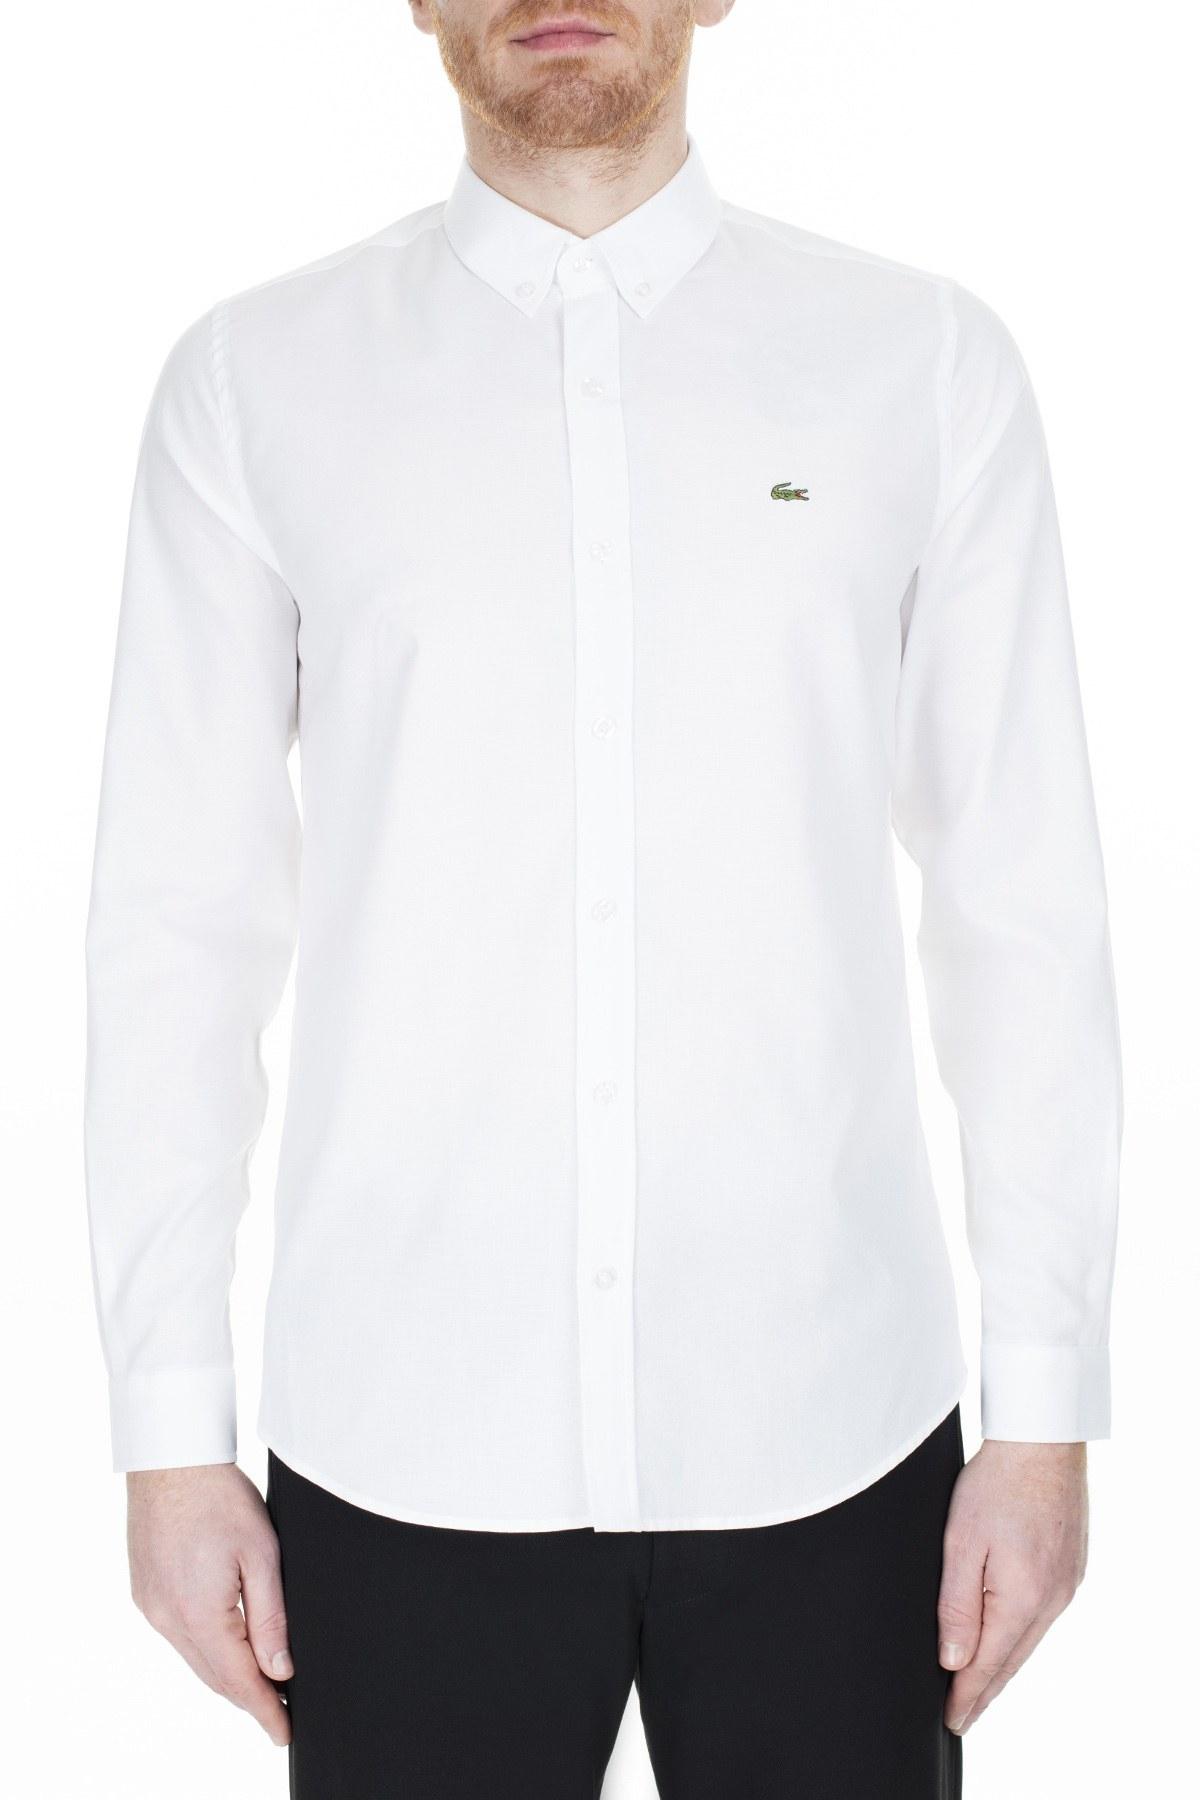 Lacoste Slim Fit Erkek Gömlek CH4976 001 BEYAZ